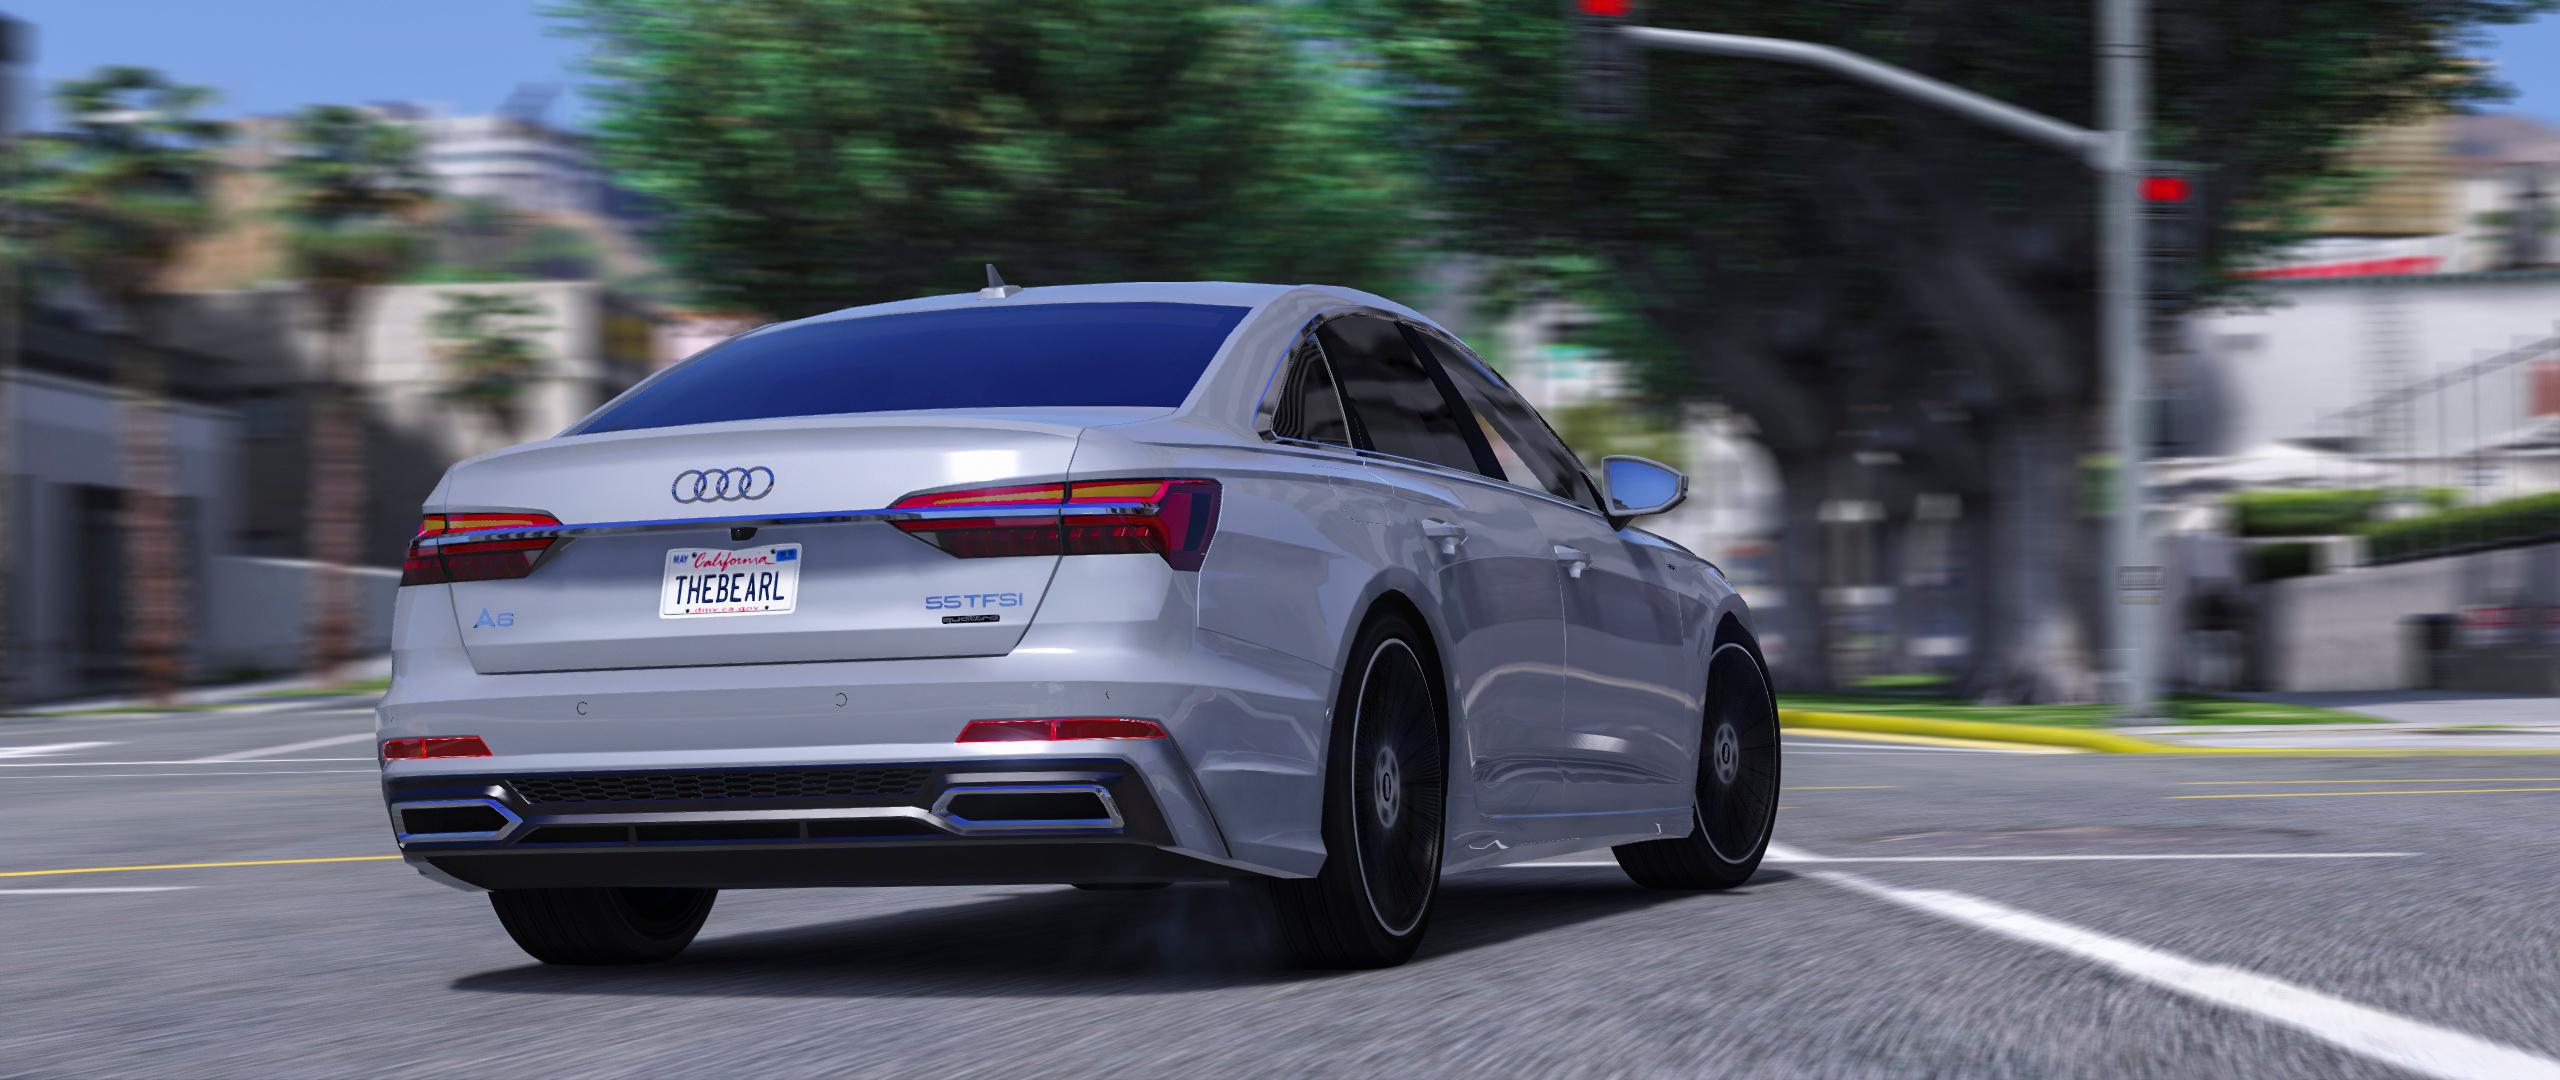 2019 Audi A6 55 Tfsi Quattro S Line Gta5 Mods Com Audi a6l 55 tfsi quattro s line